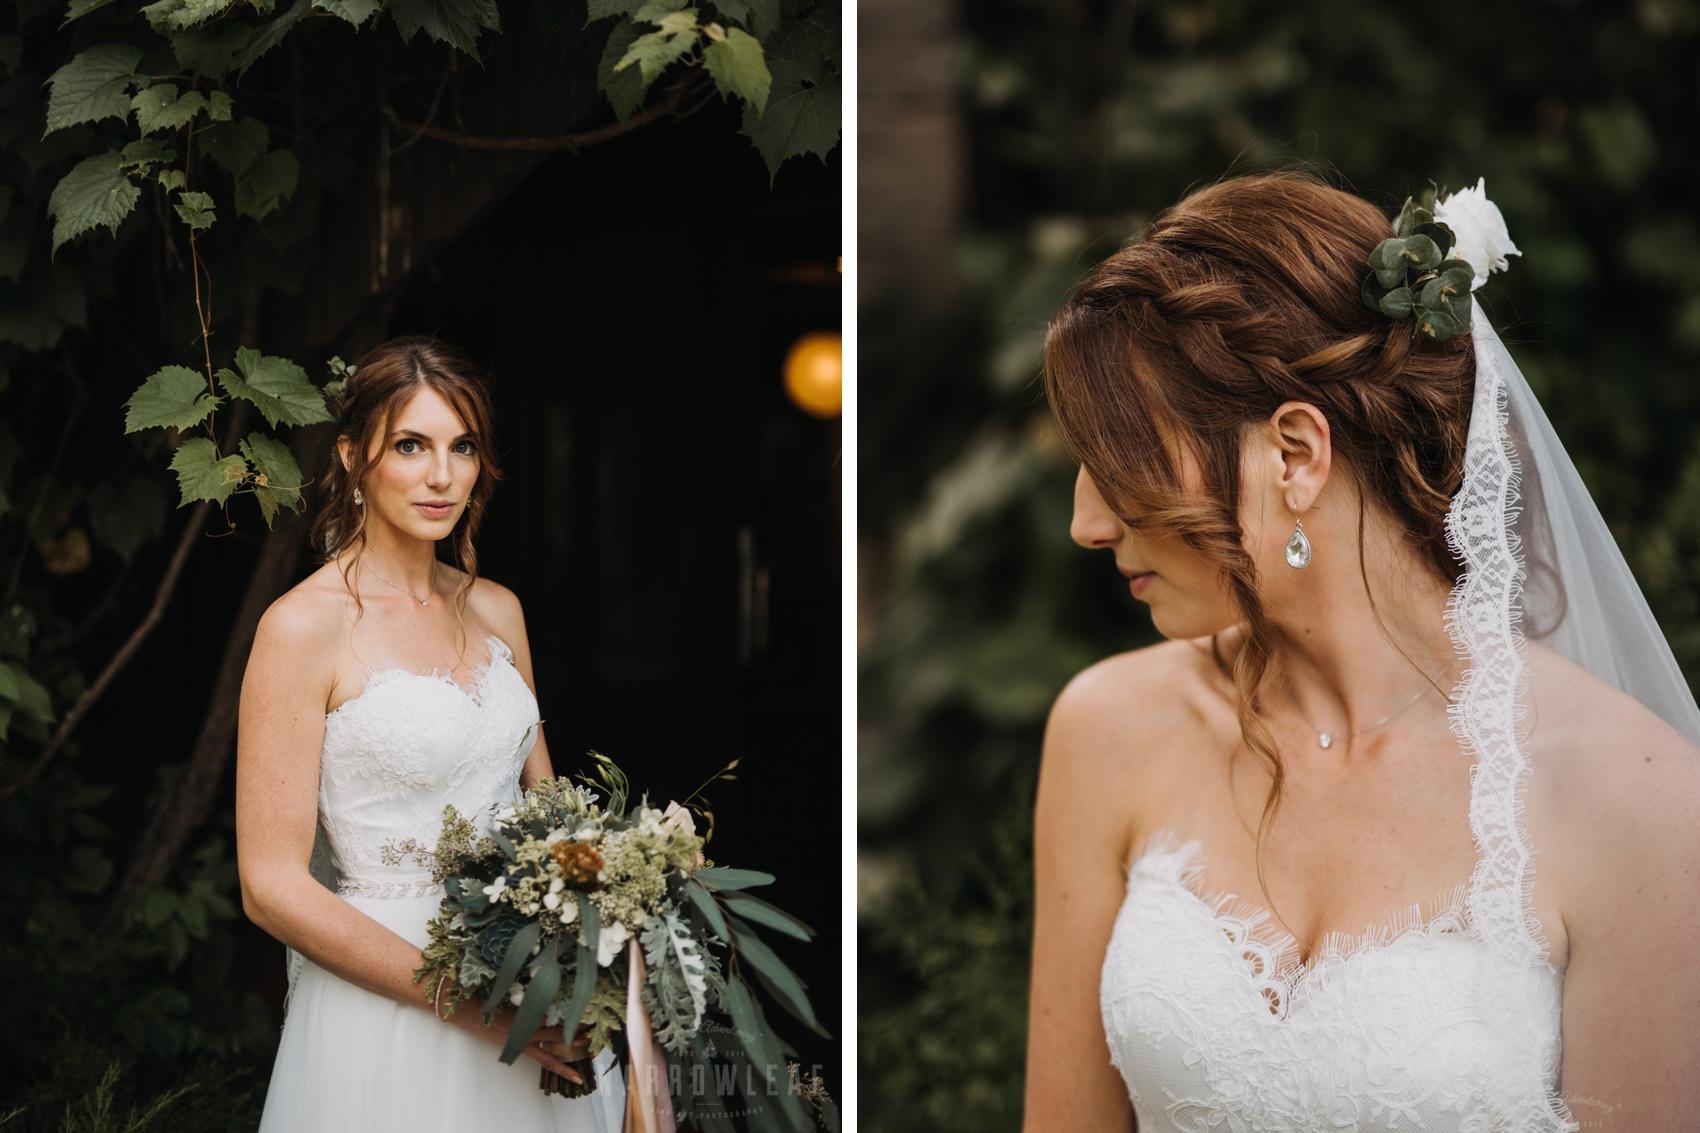 Earthy bride photos